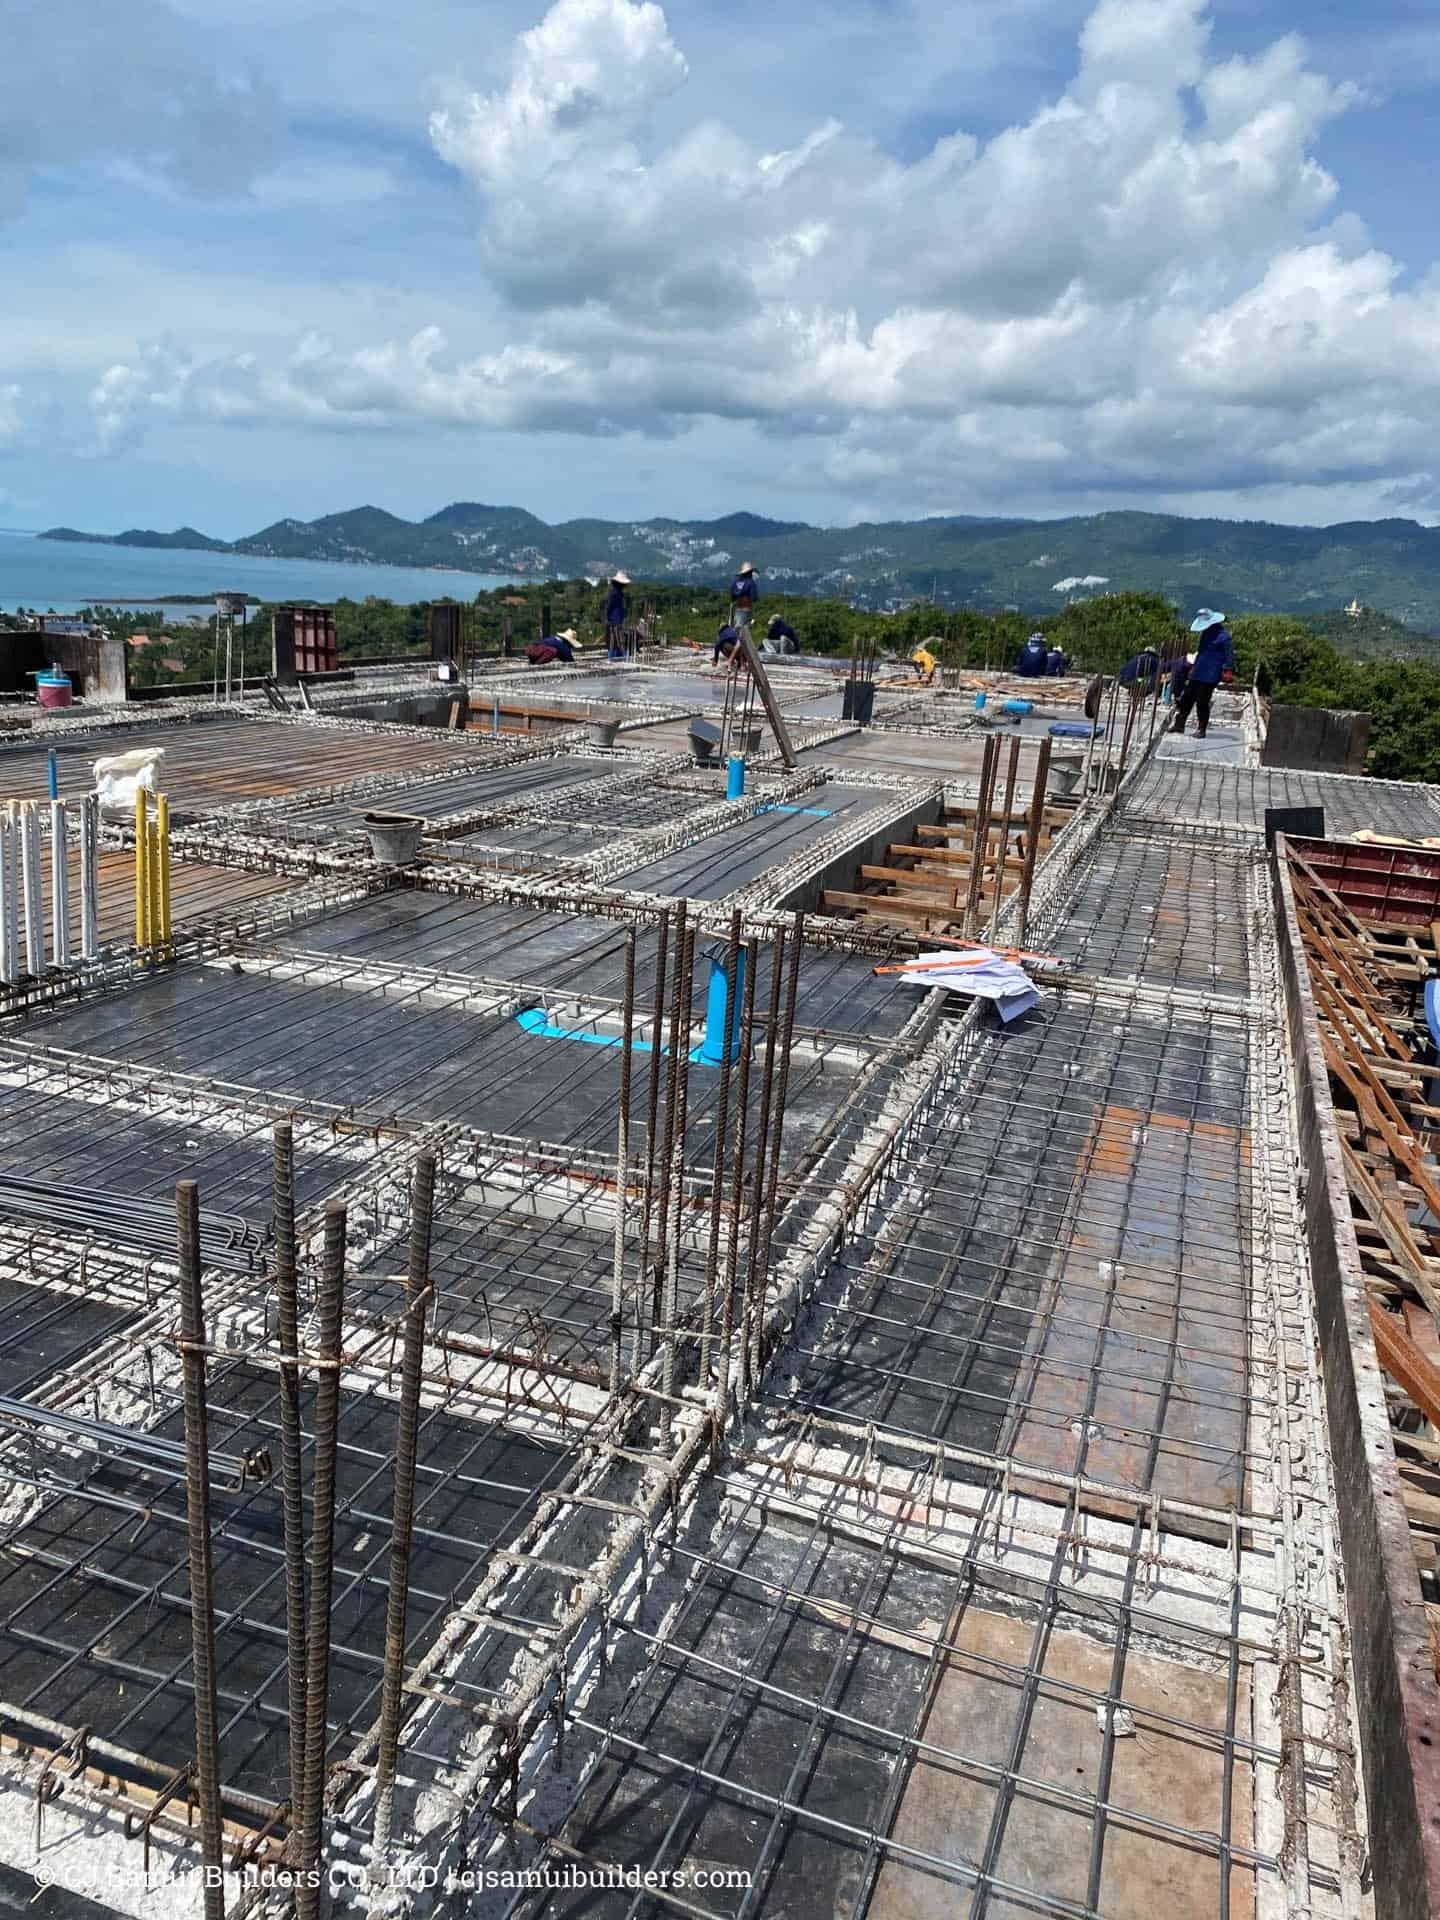 CJ Samui Builders Co., LTD